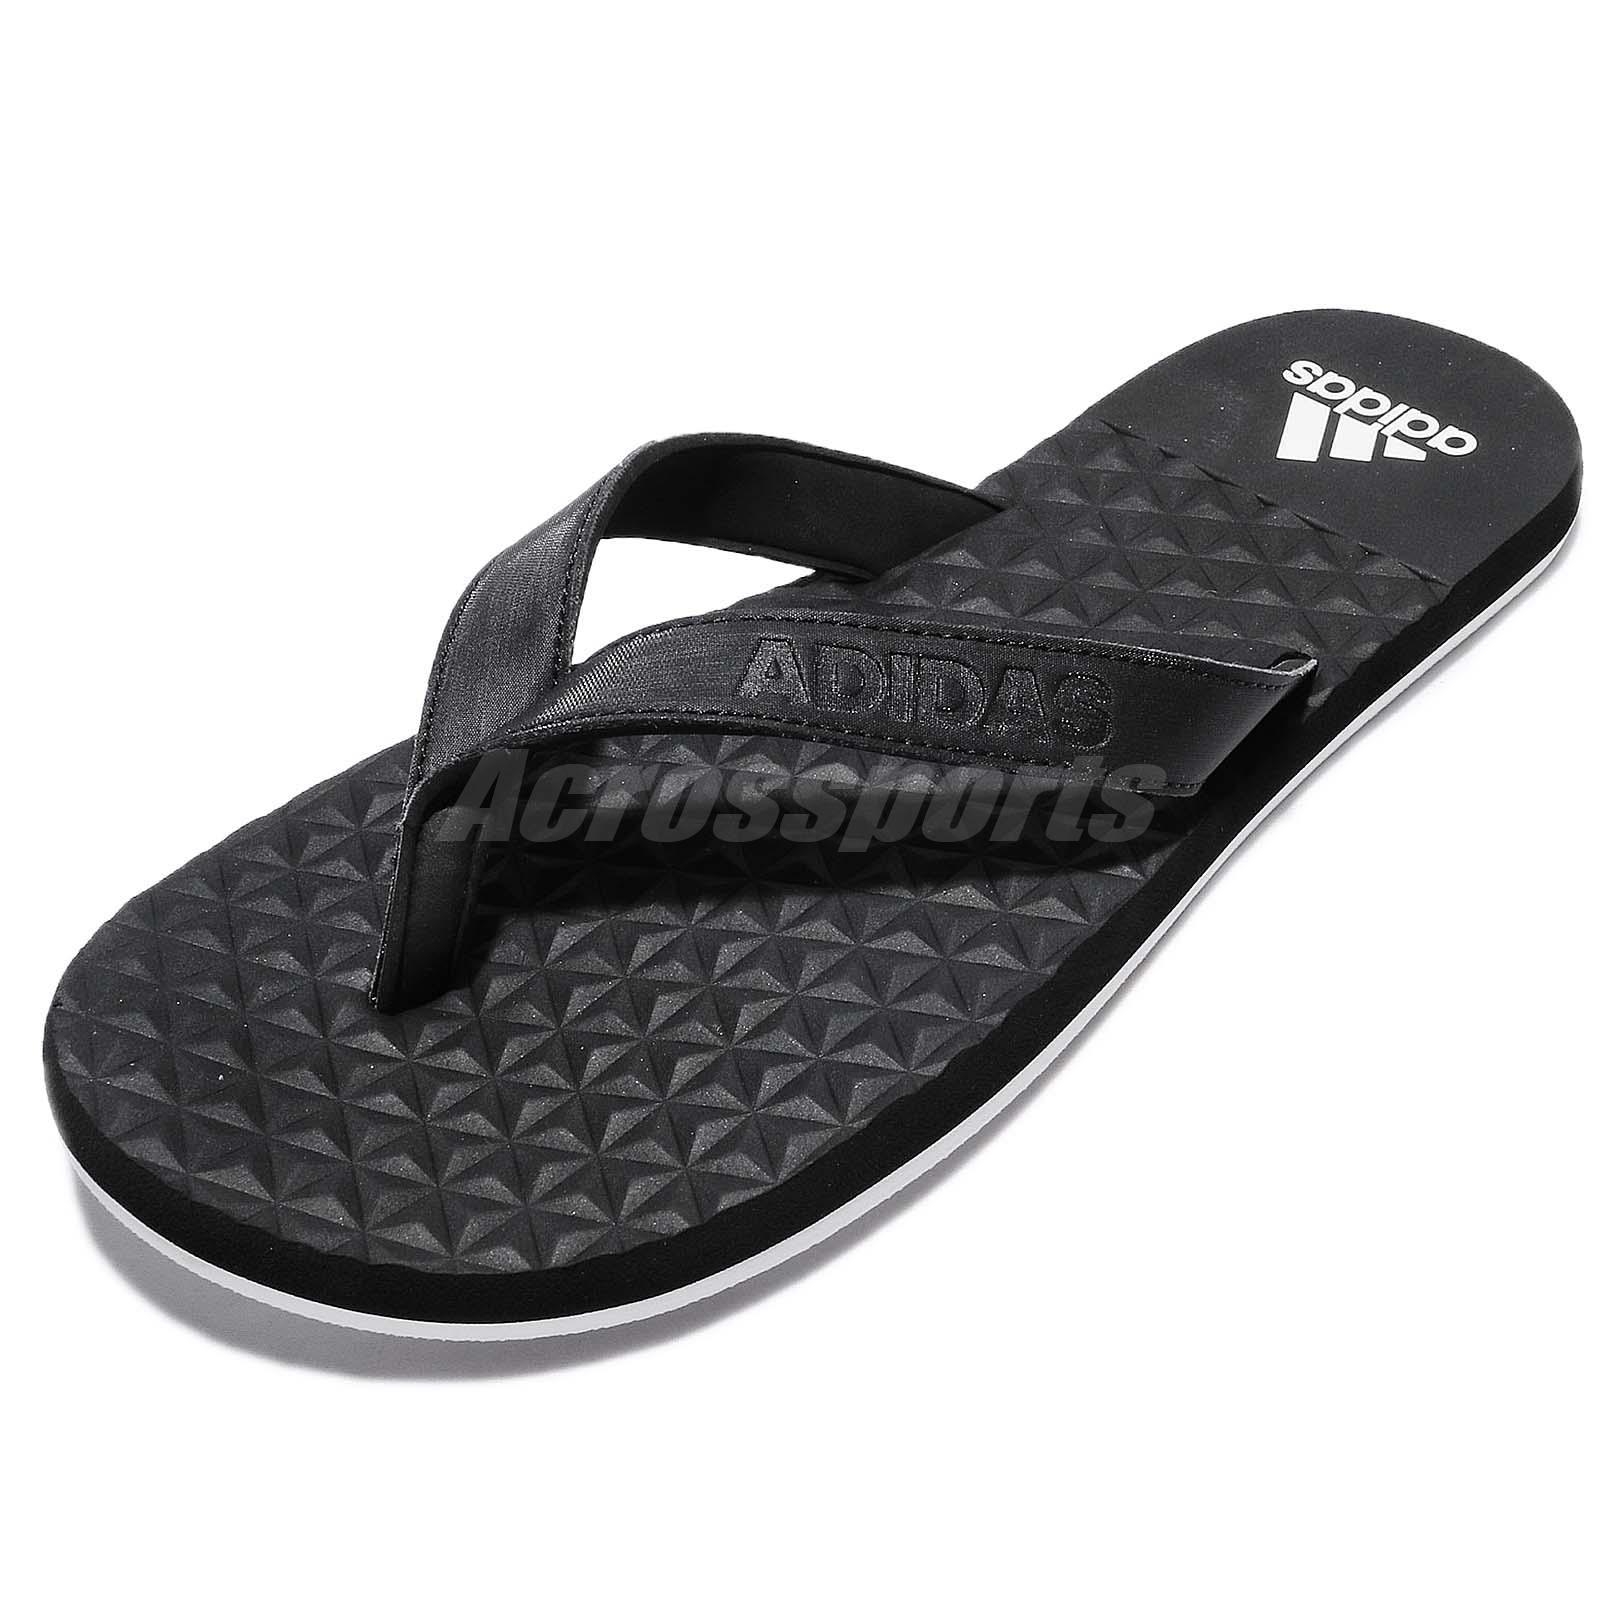 separation shoes bc7cf 4b220 ... promo code adidas performance eezay soft thong black white men sandal  flip flops bb0507 210fa 44f57